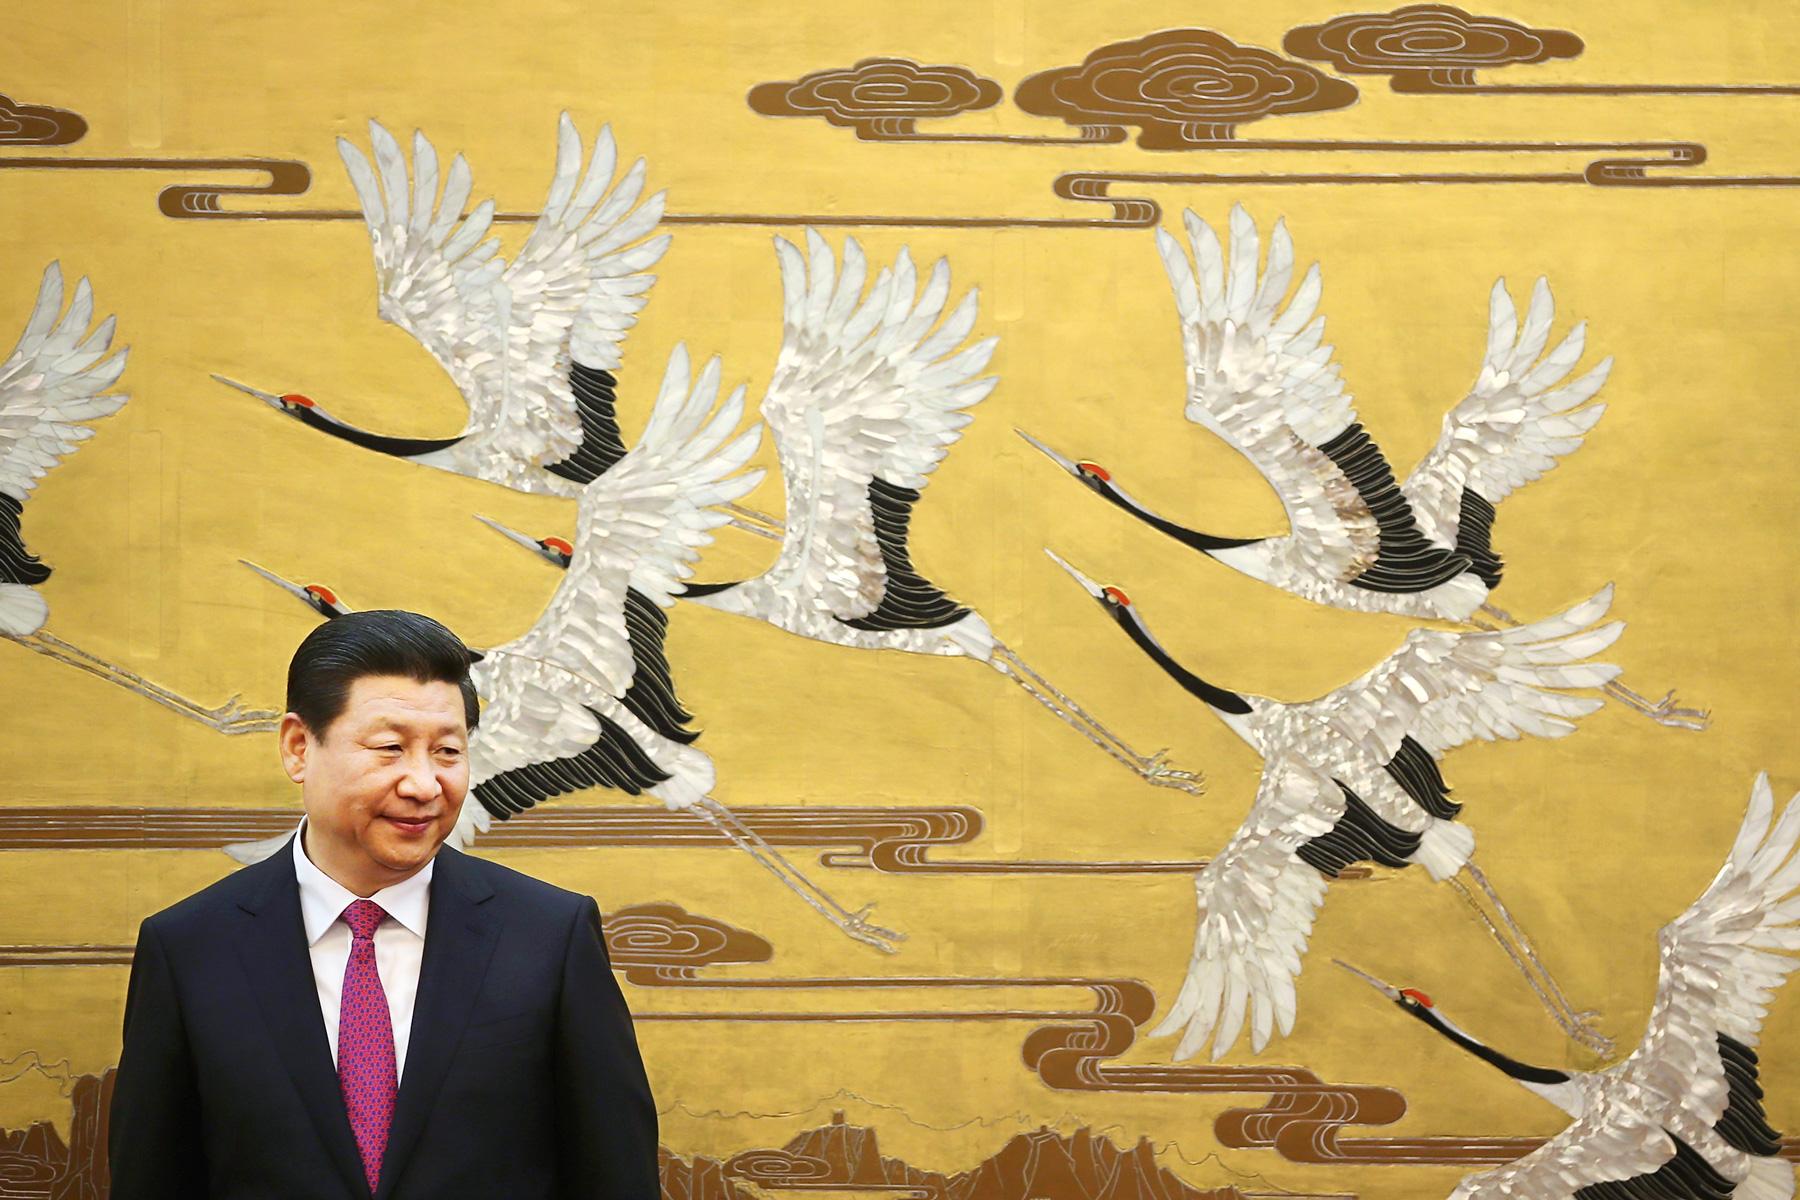 Spezial-Editorial: Darum kann Xi Jinping Chinas erster gewählter Präsident werden!